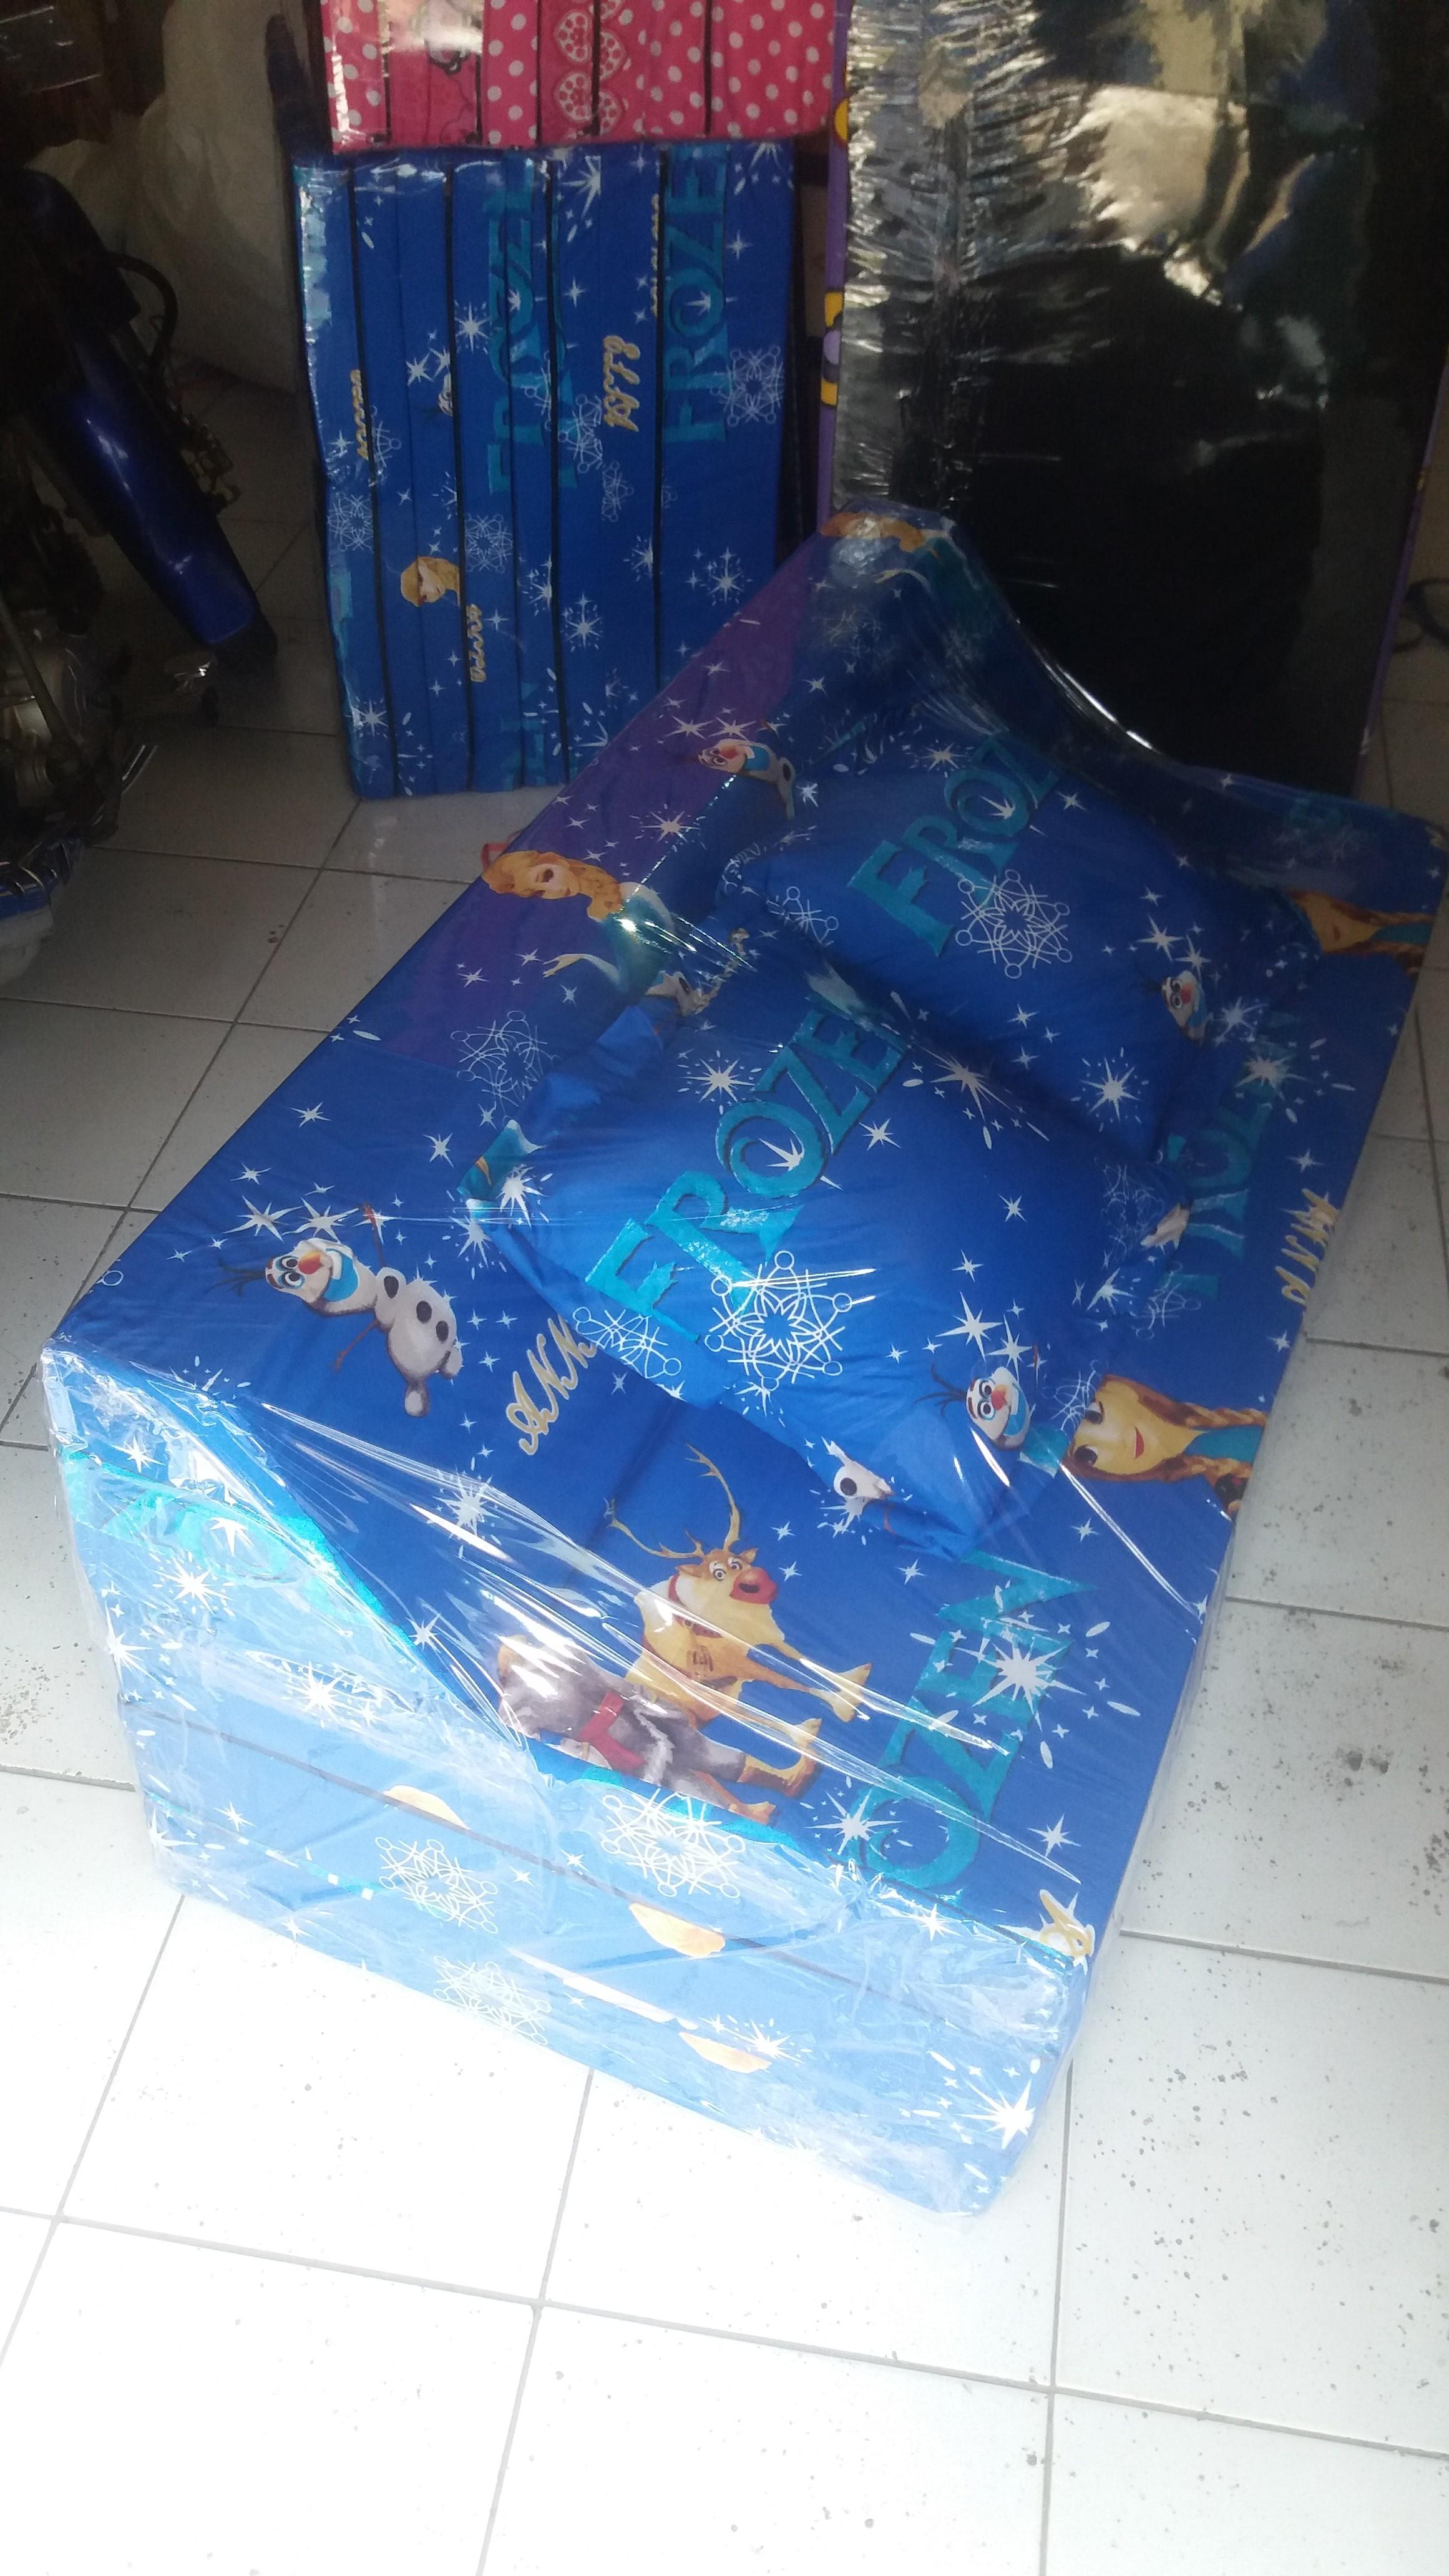 Sofa bed Busa Biasa Frozen 120 | Grosir Kasur Lipat Busa ...